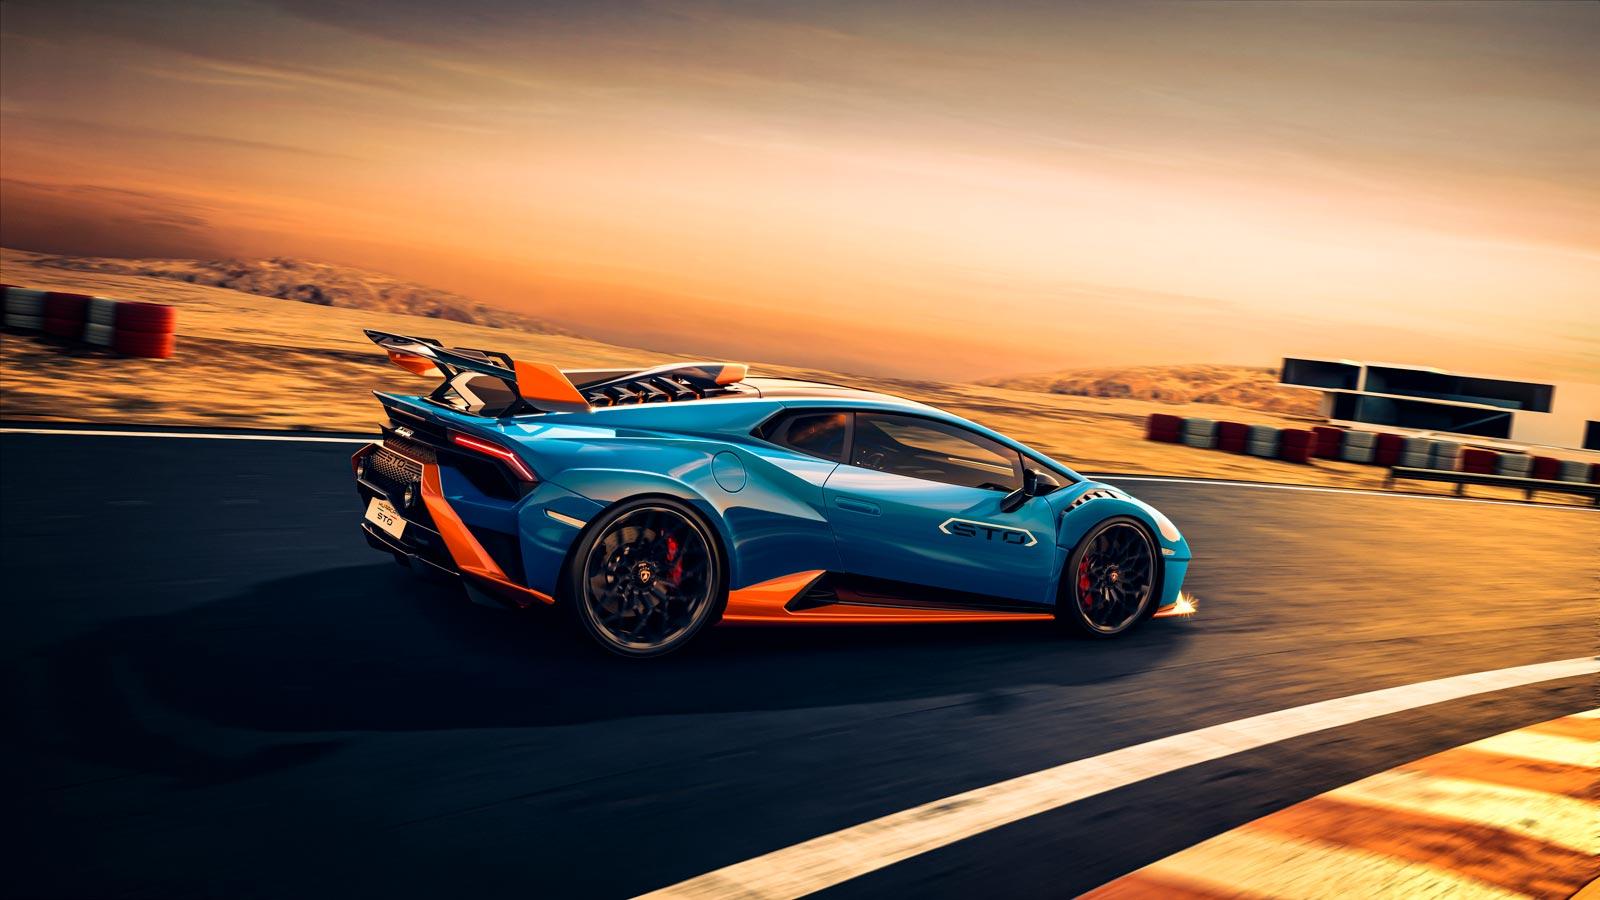 Lamborghini Huracan STO - From racetrack to road image 6